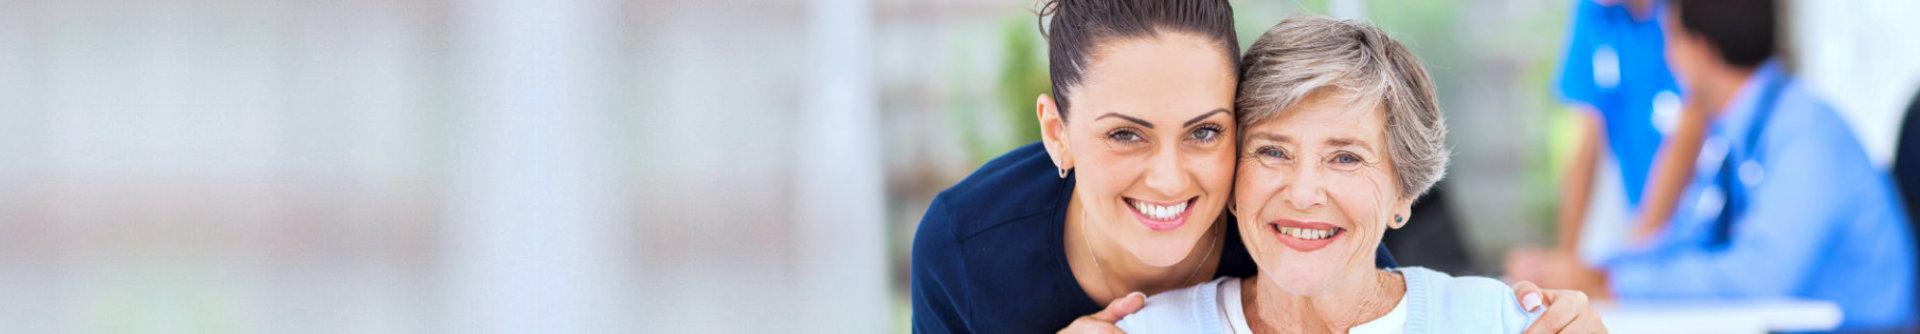 portrait of caregiver and senior woman smiling